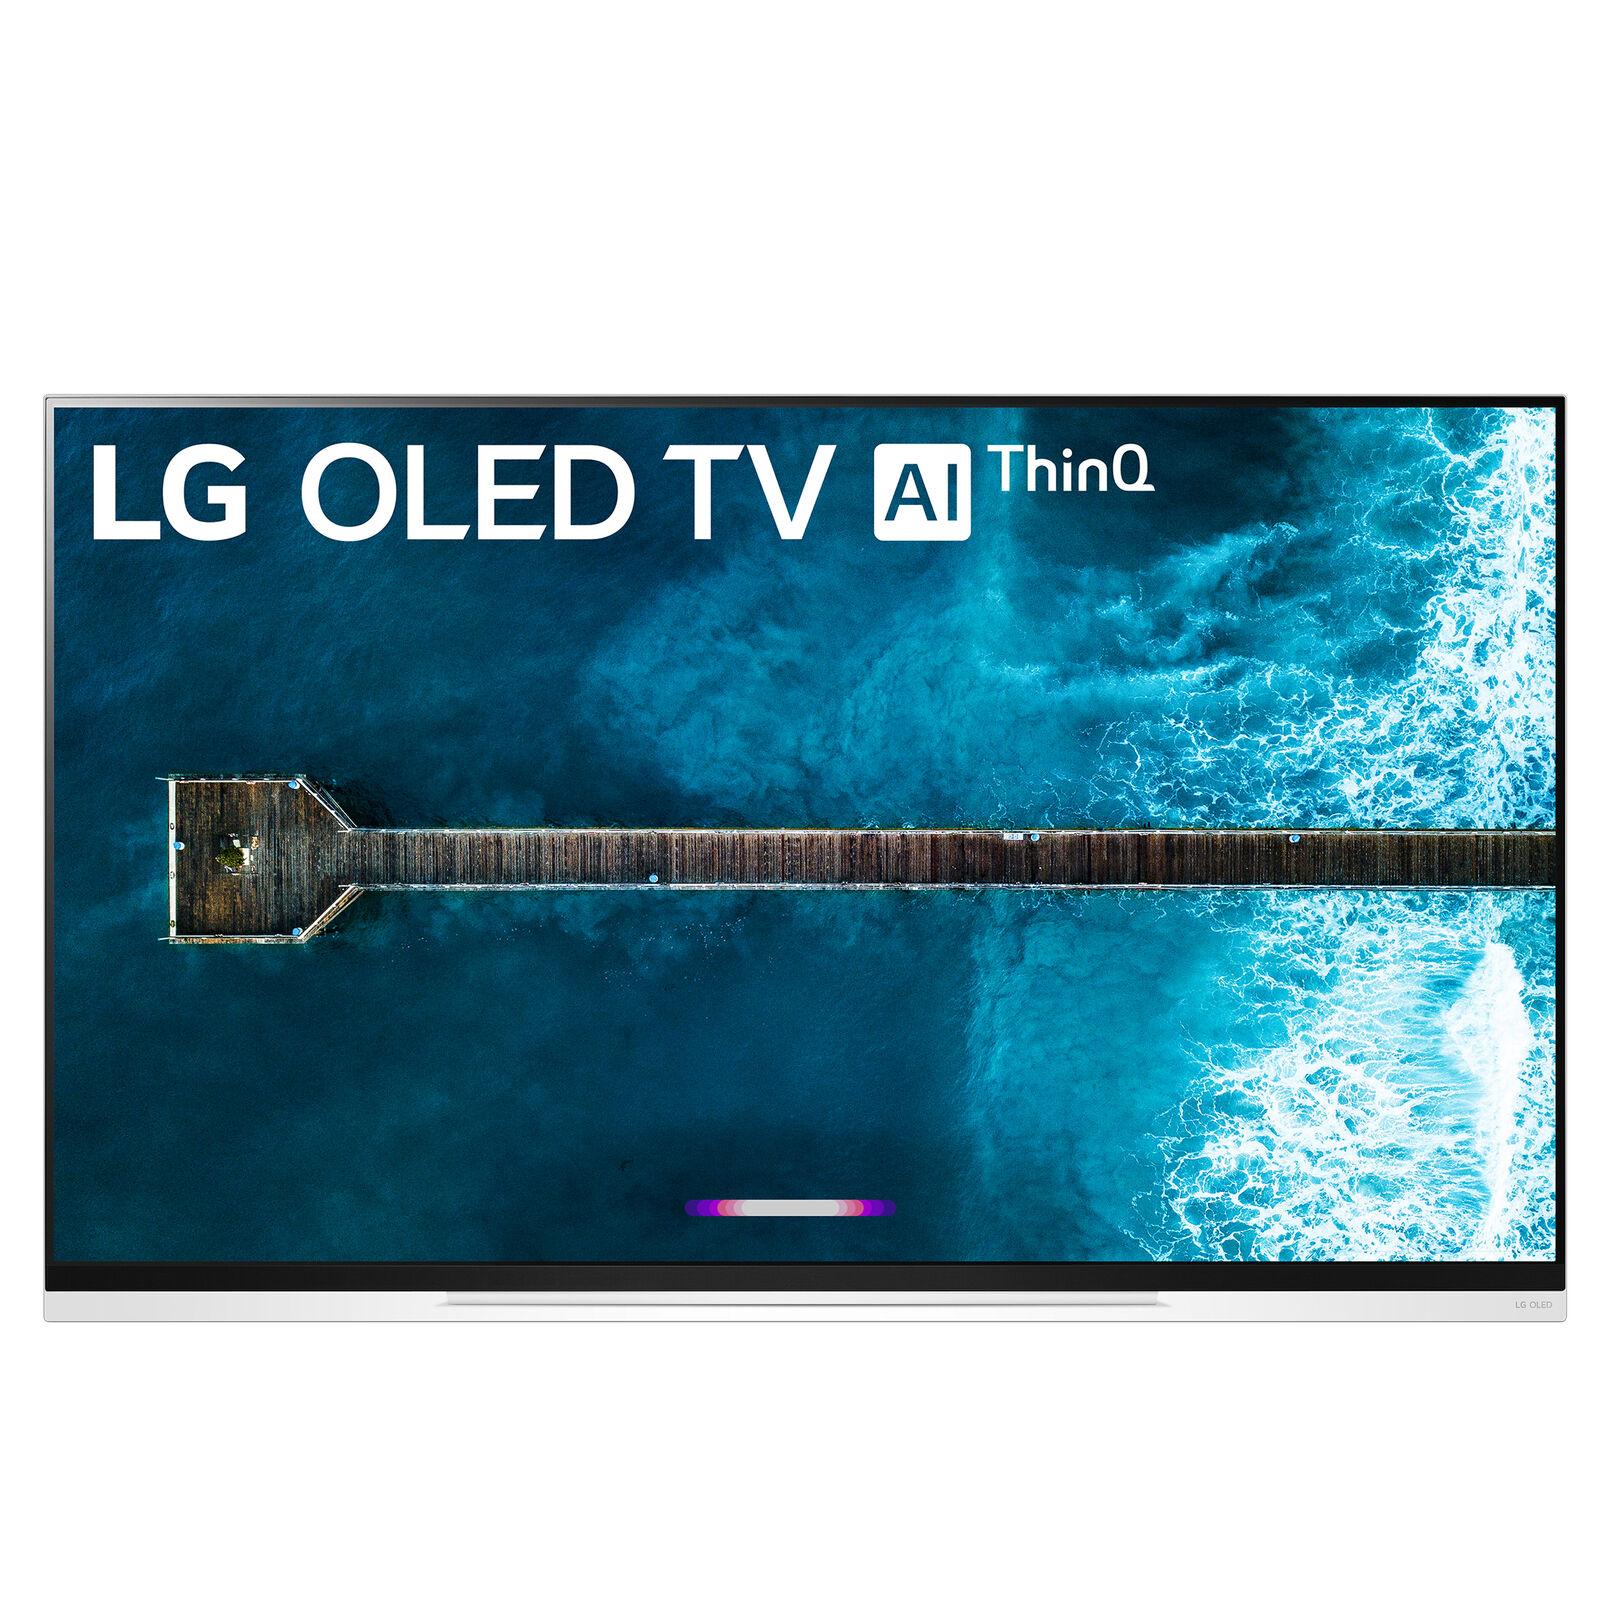 "(auth dealer) LG OLED's: 65"" OLED65E9PUA 4K TV $1999 or 55"" OLED55C9PUA 4k tv $1289 + free s/h"